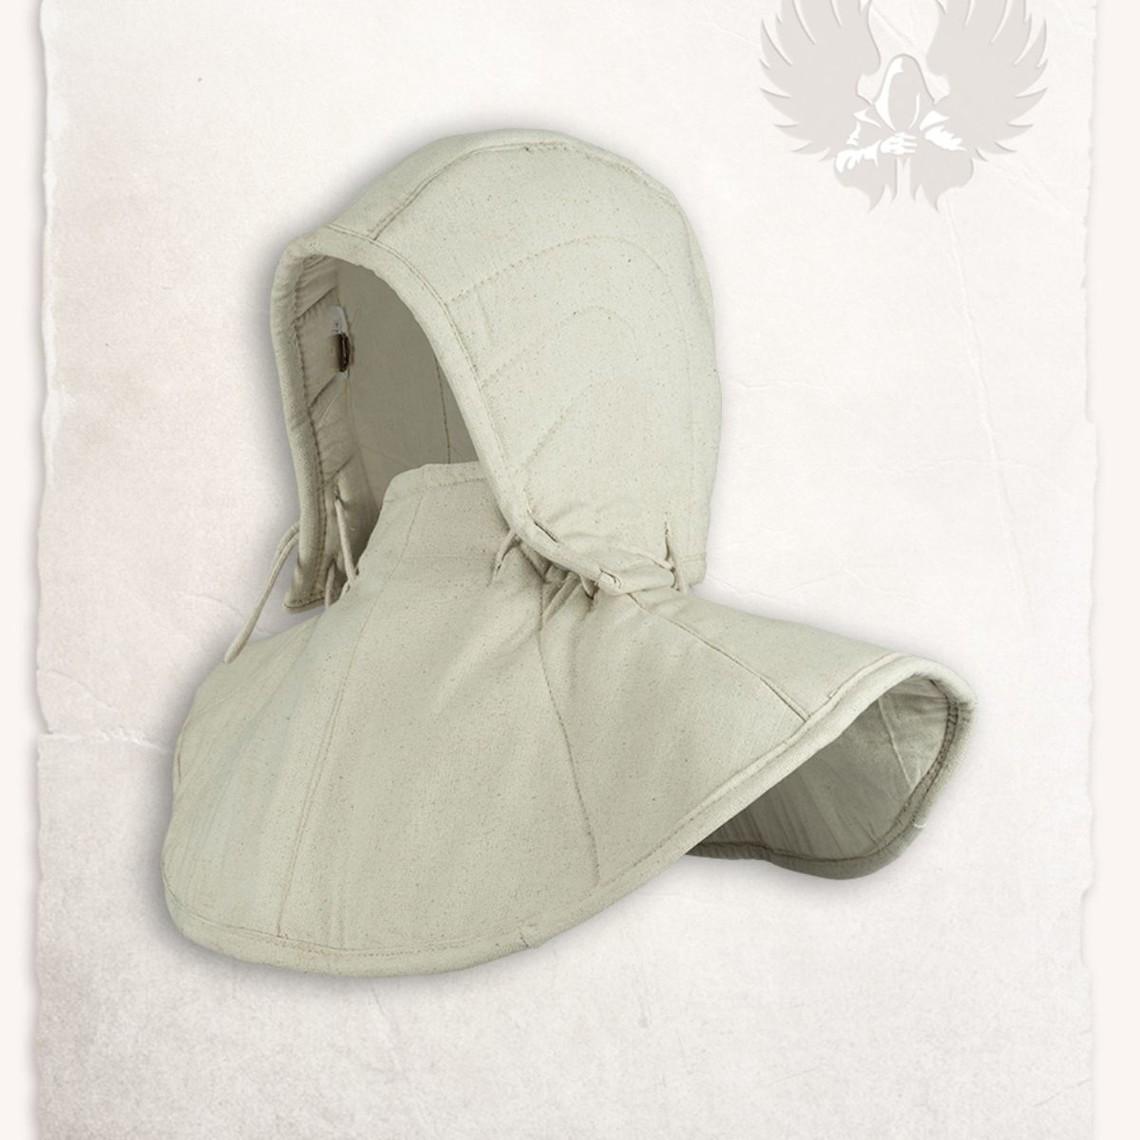 Mytholon campana Gambesón y el collar crema Aulber